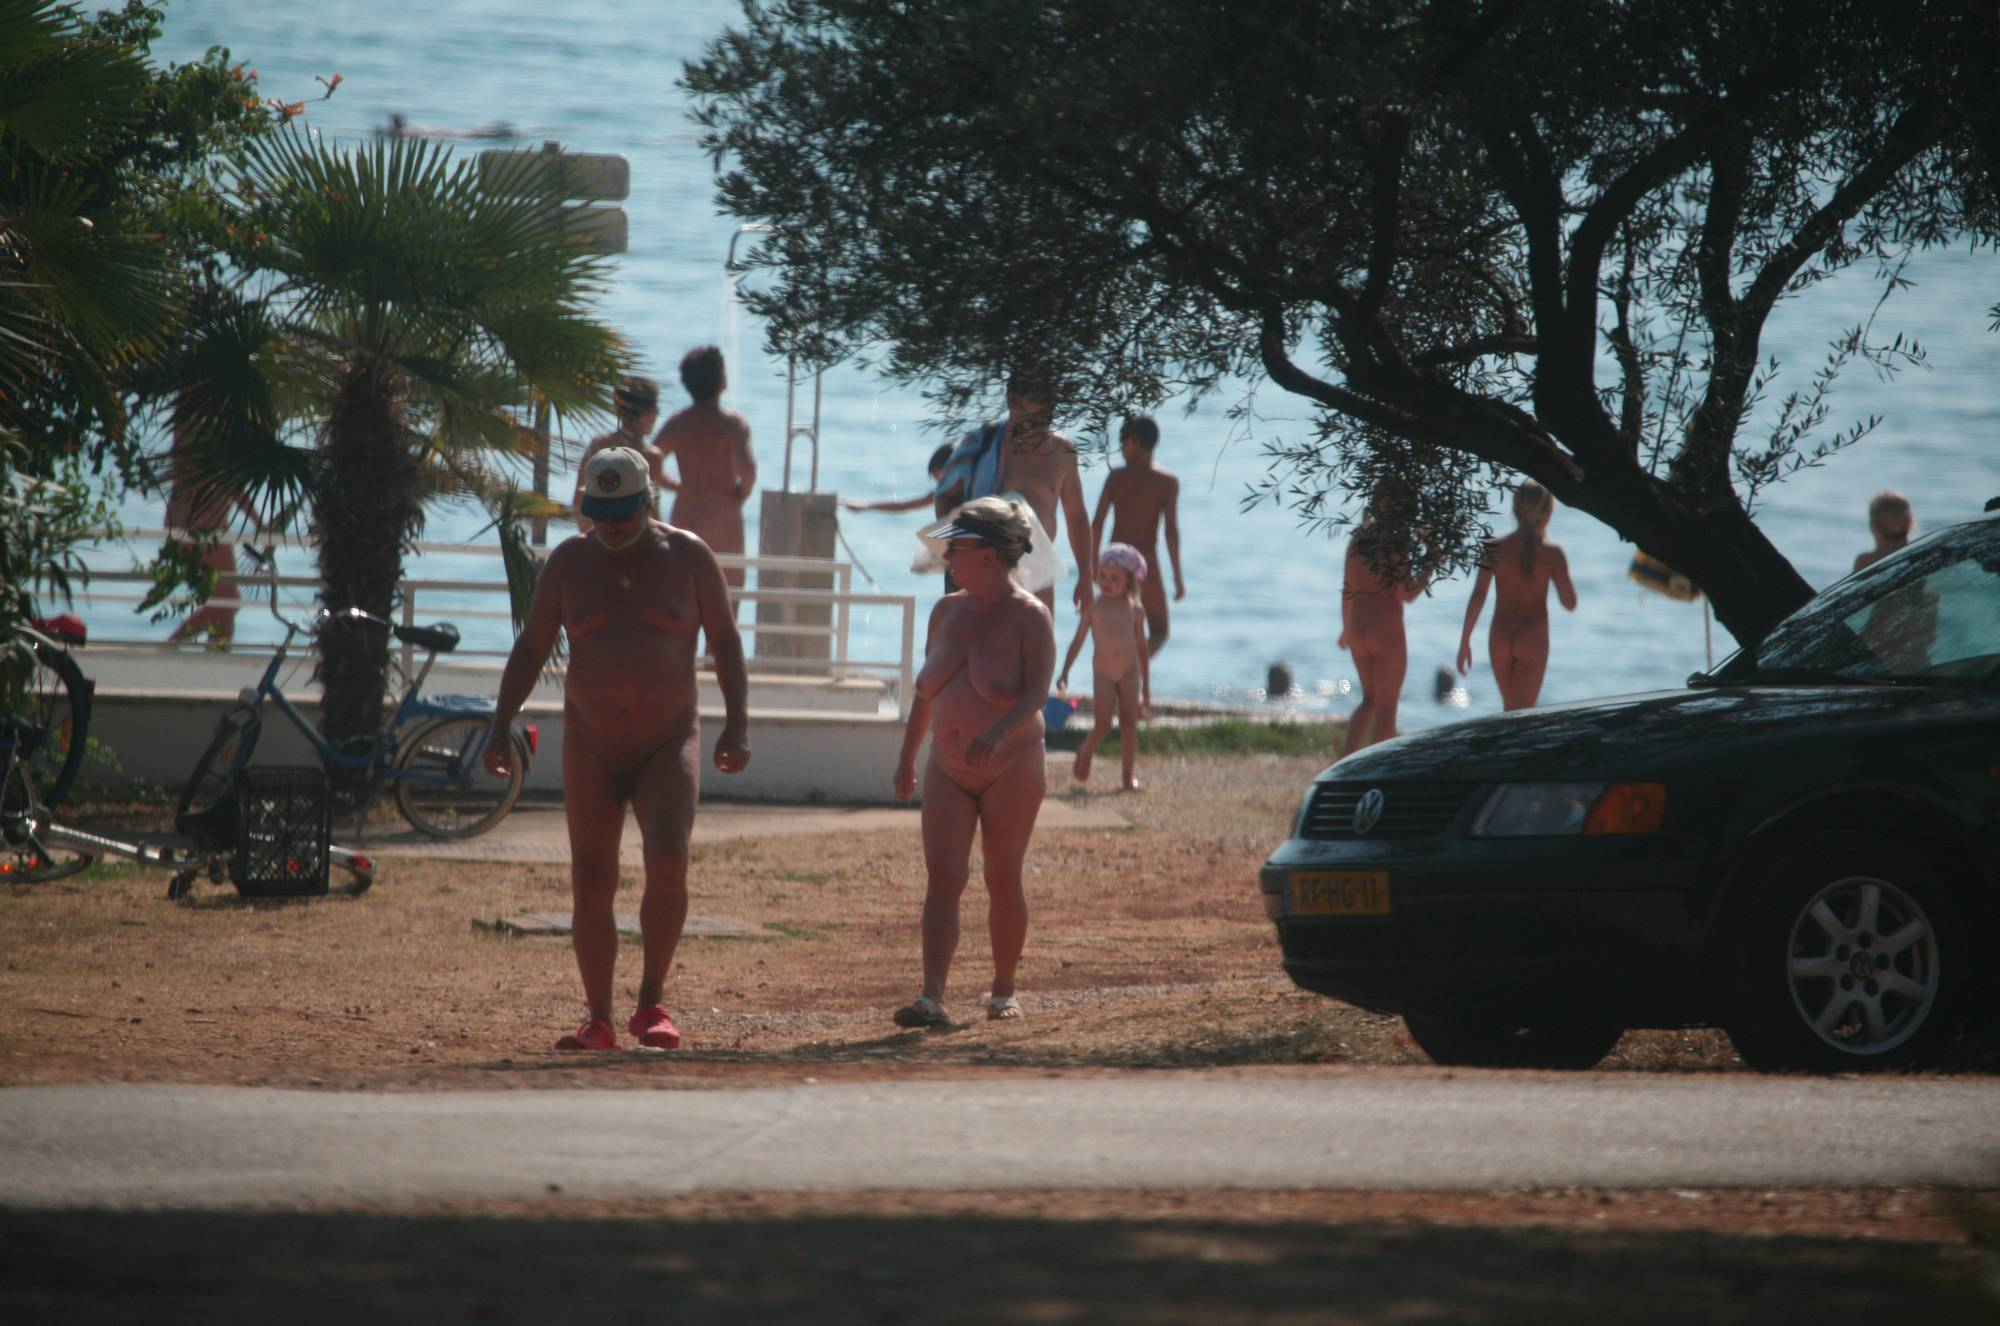 Pure Nudism Pics Nuda FKK Visitor Pass-By - 3